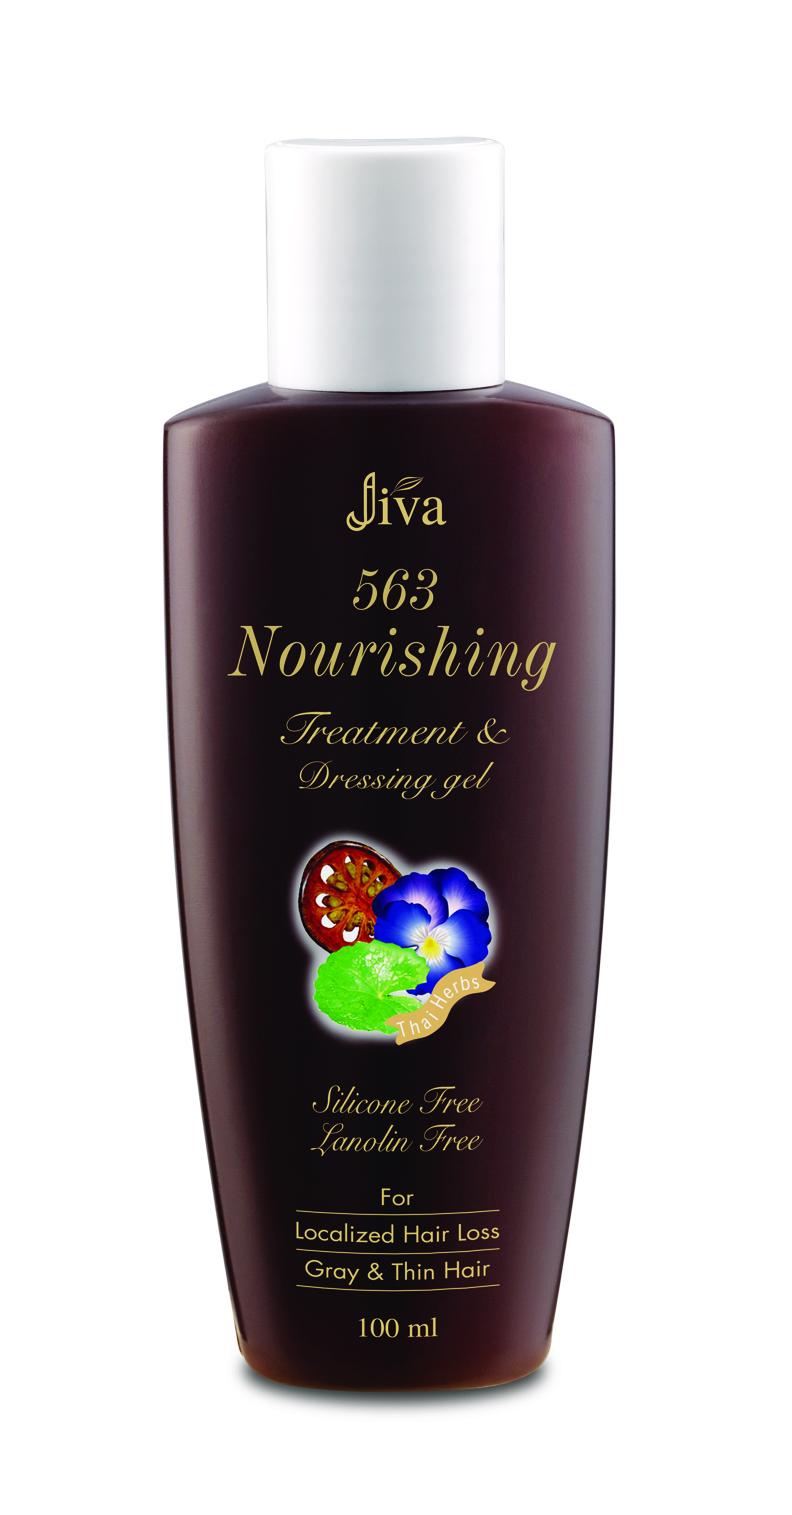 JIVA Nourishing Treatment and Dressing Gel - จีวา นอริชชิ่ง ทรีทเม้นท์ แอนด์ เดรซซิ่ง เจล